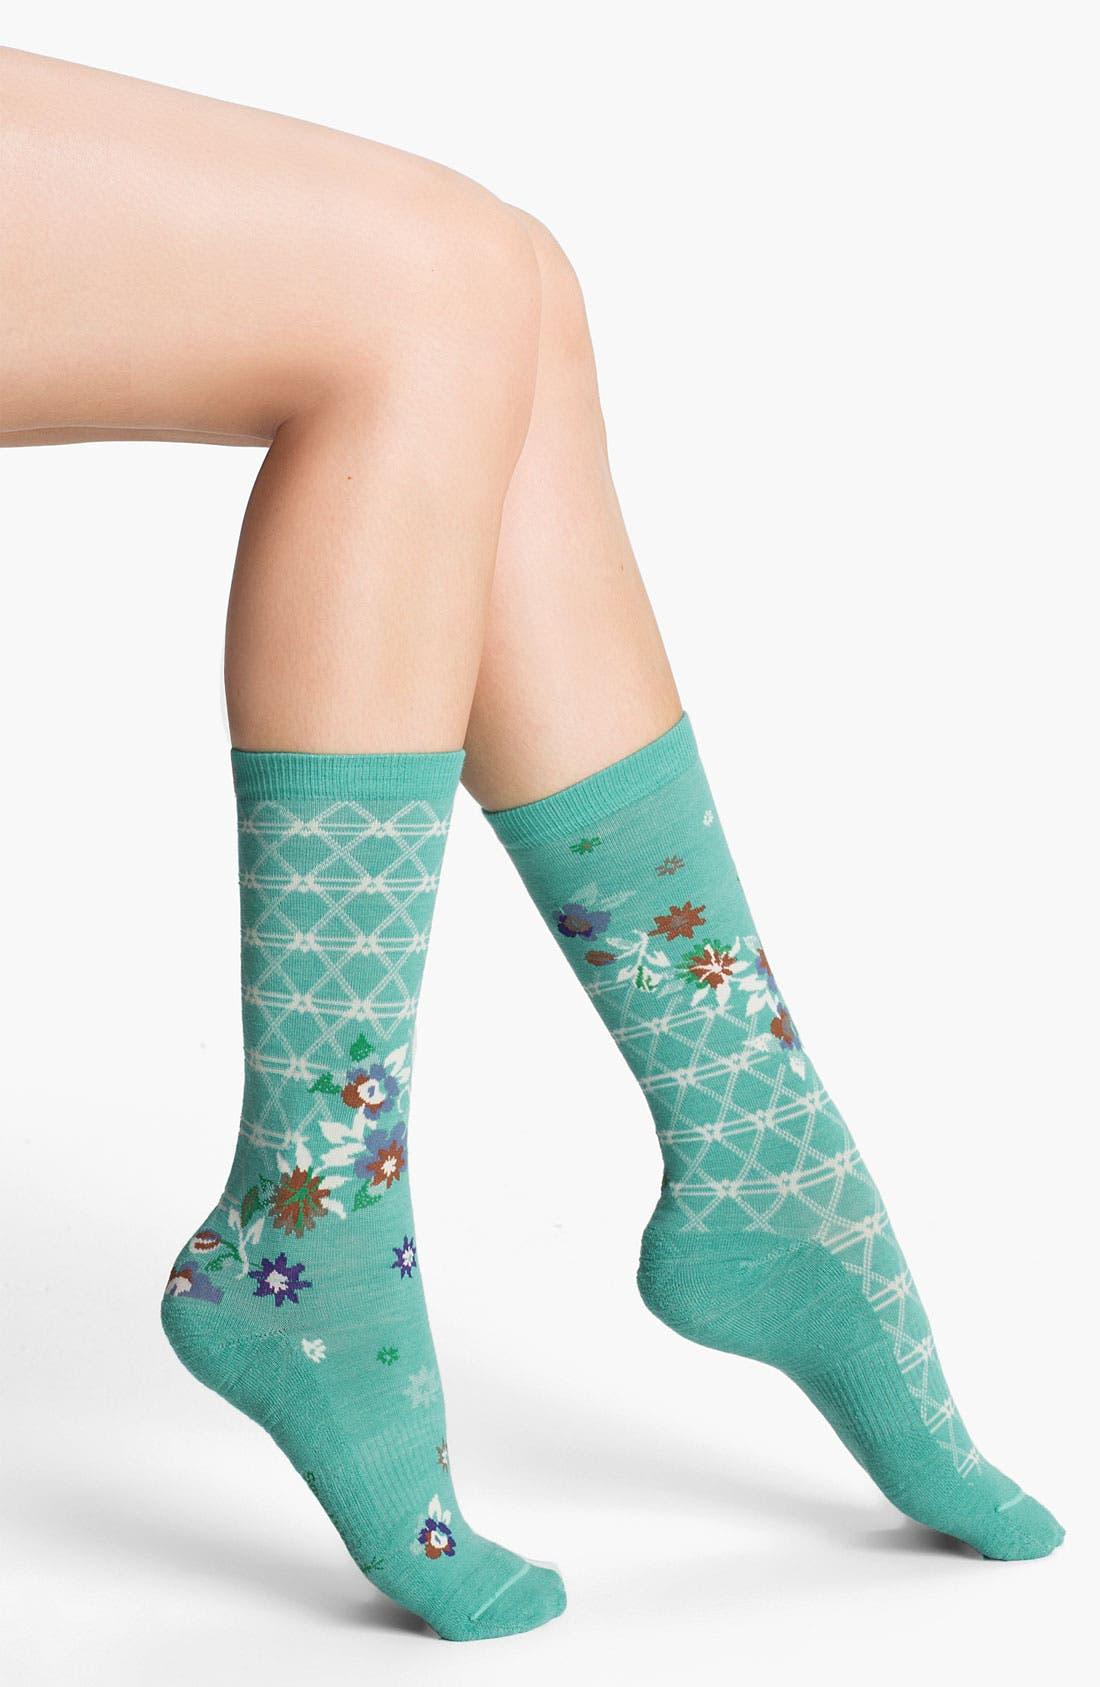 Main Image - Smartwool 'Cherry Blossom' Socks